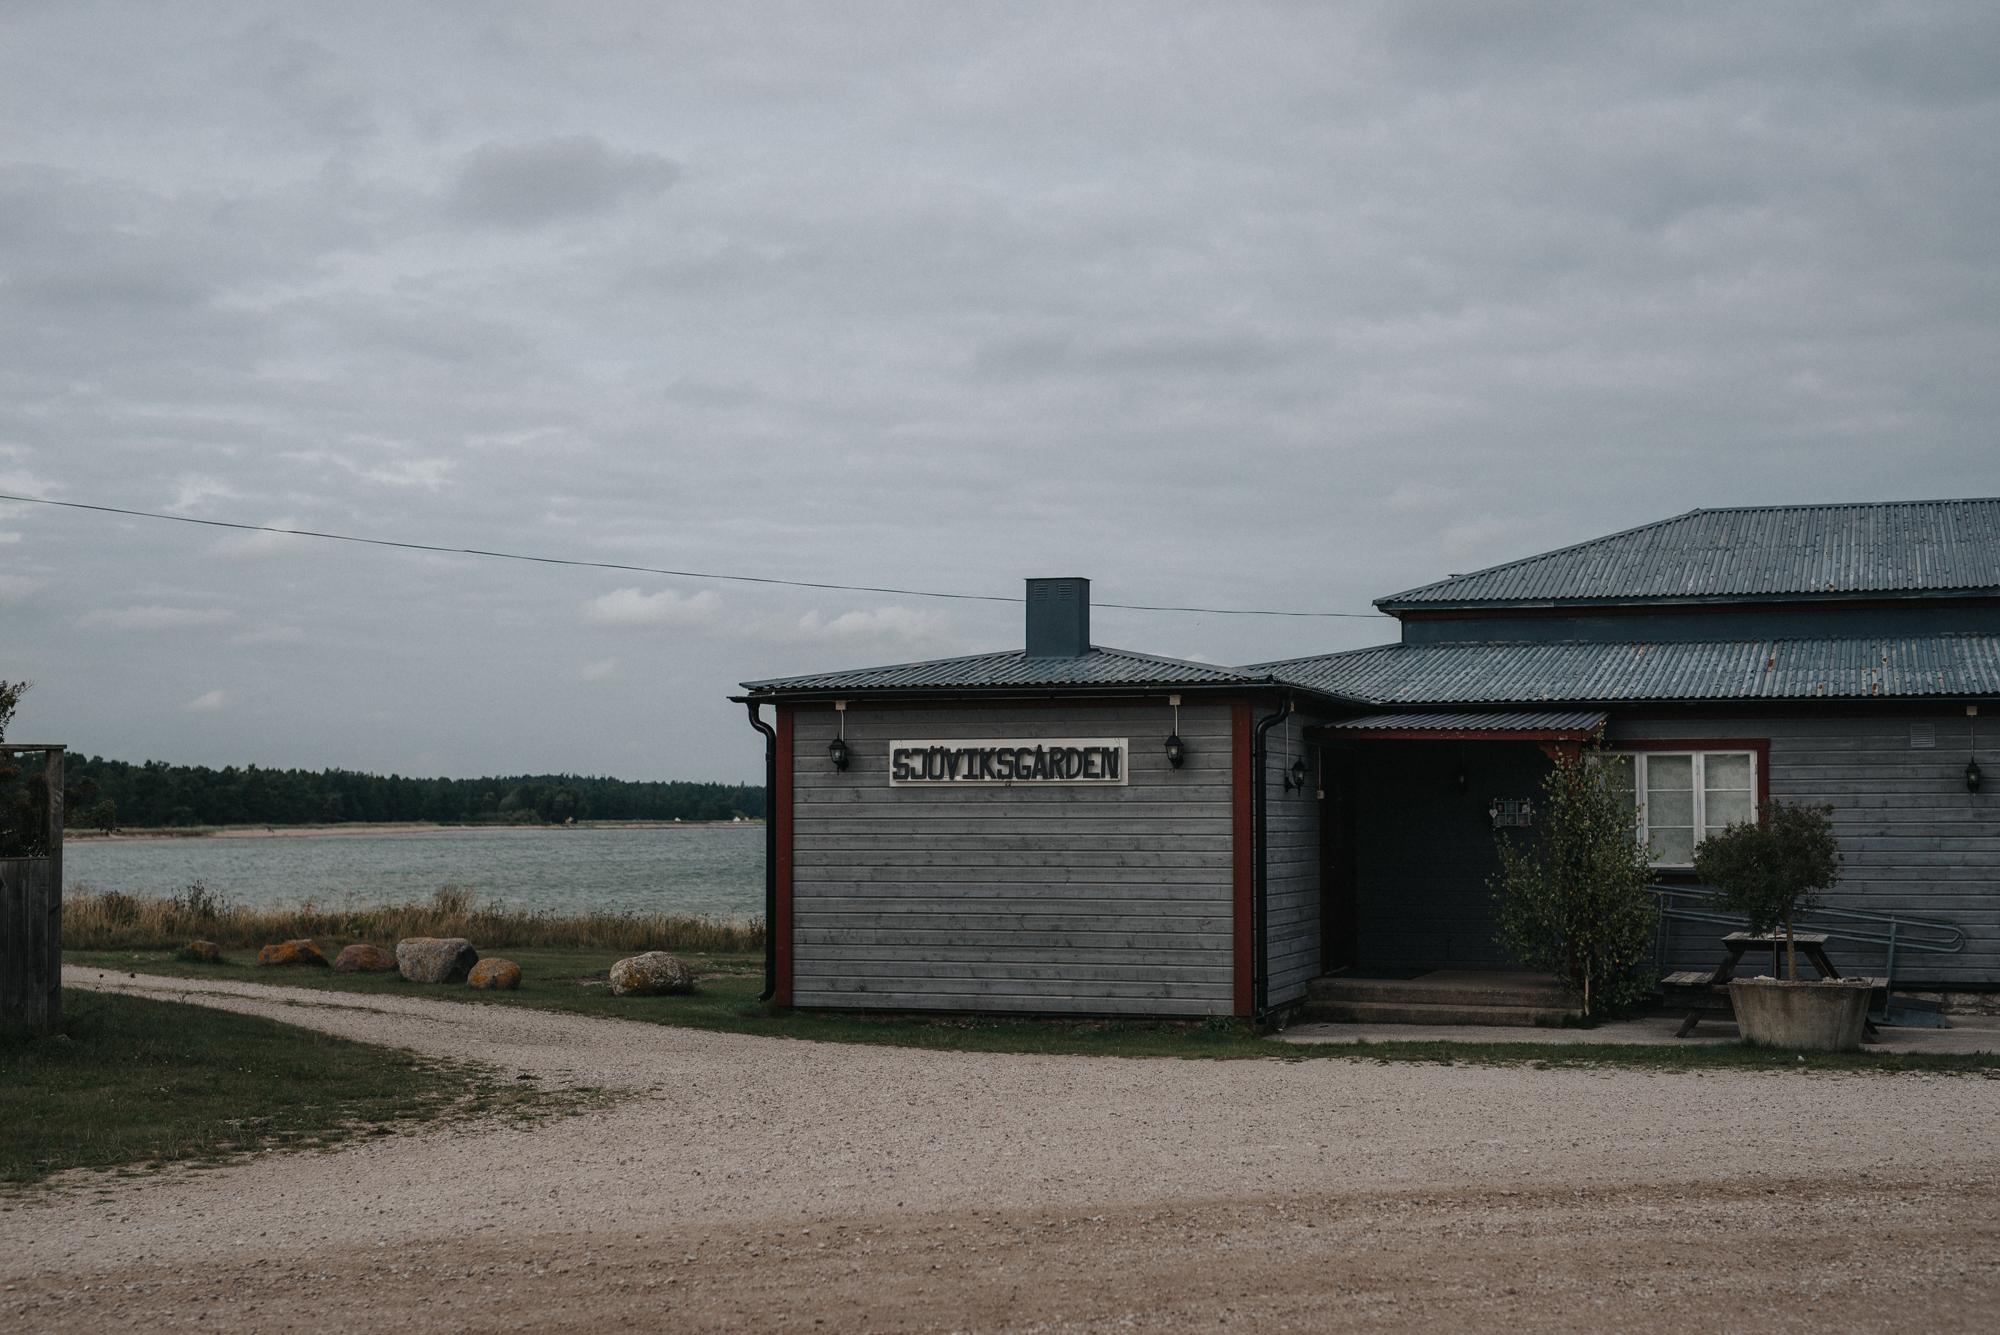 050-bröllopsfotograf-folhammar-gotland-neas-fotografi.jpg